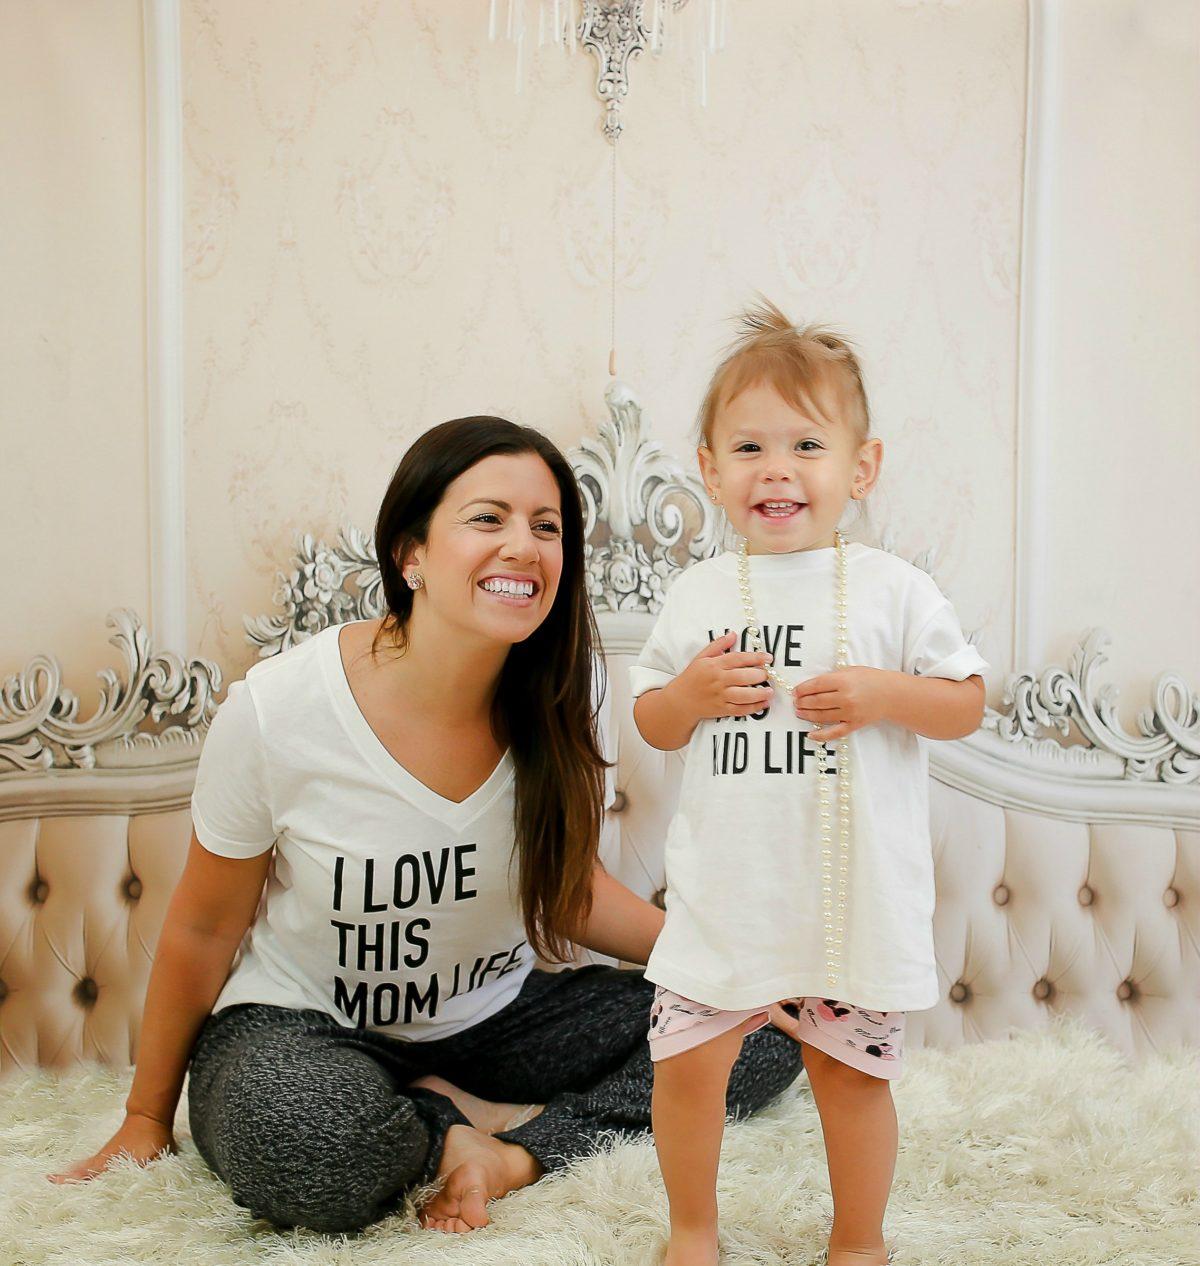 Live Styled Shop etsy, etsy Mom tee, Jaime Cittadino, mommy and me tees